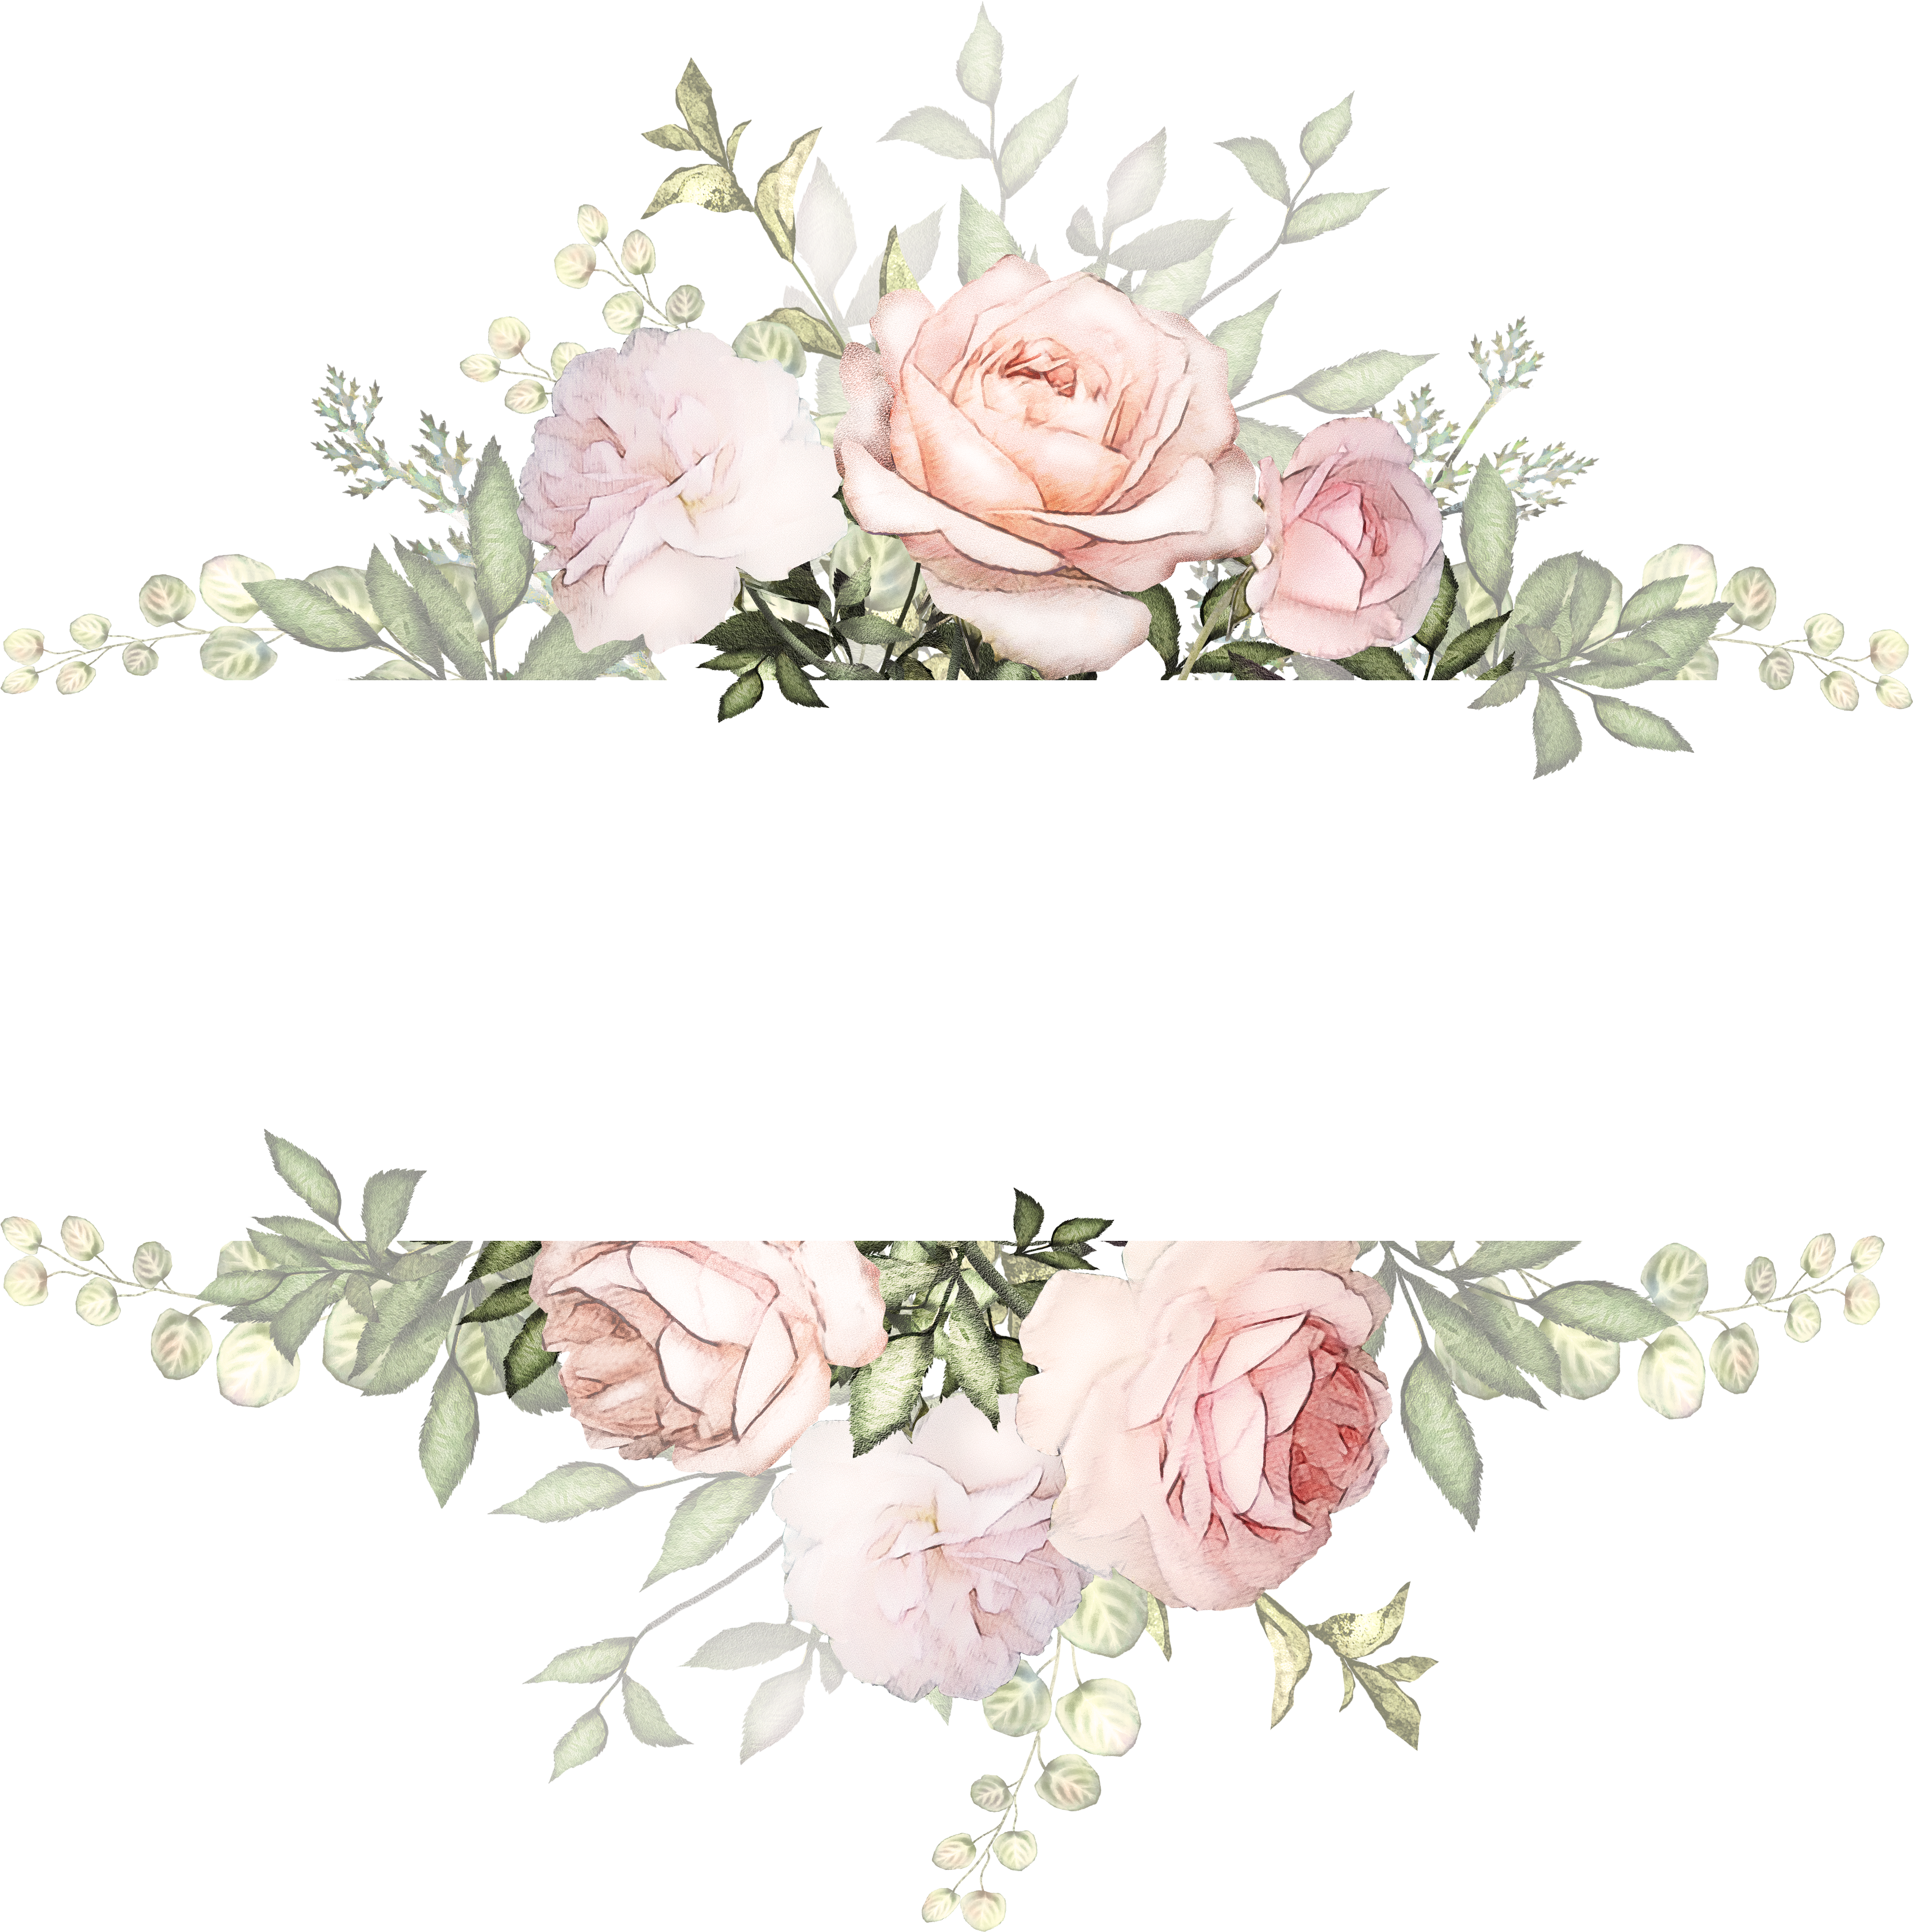 Flower Watercolor - Vintage Watercolor Flowers Background ...